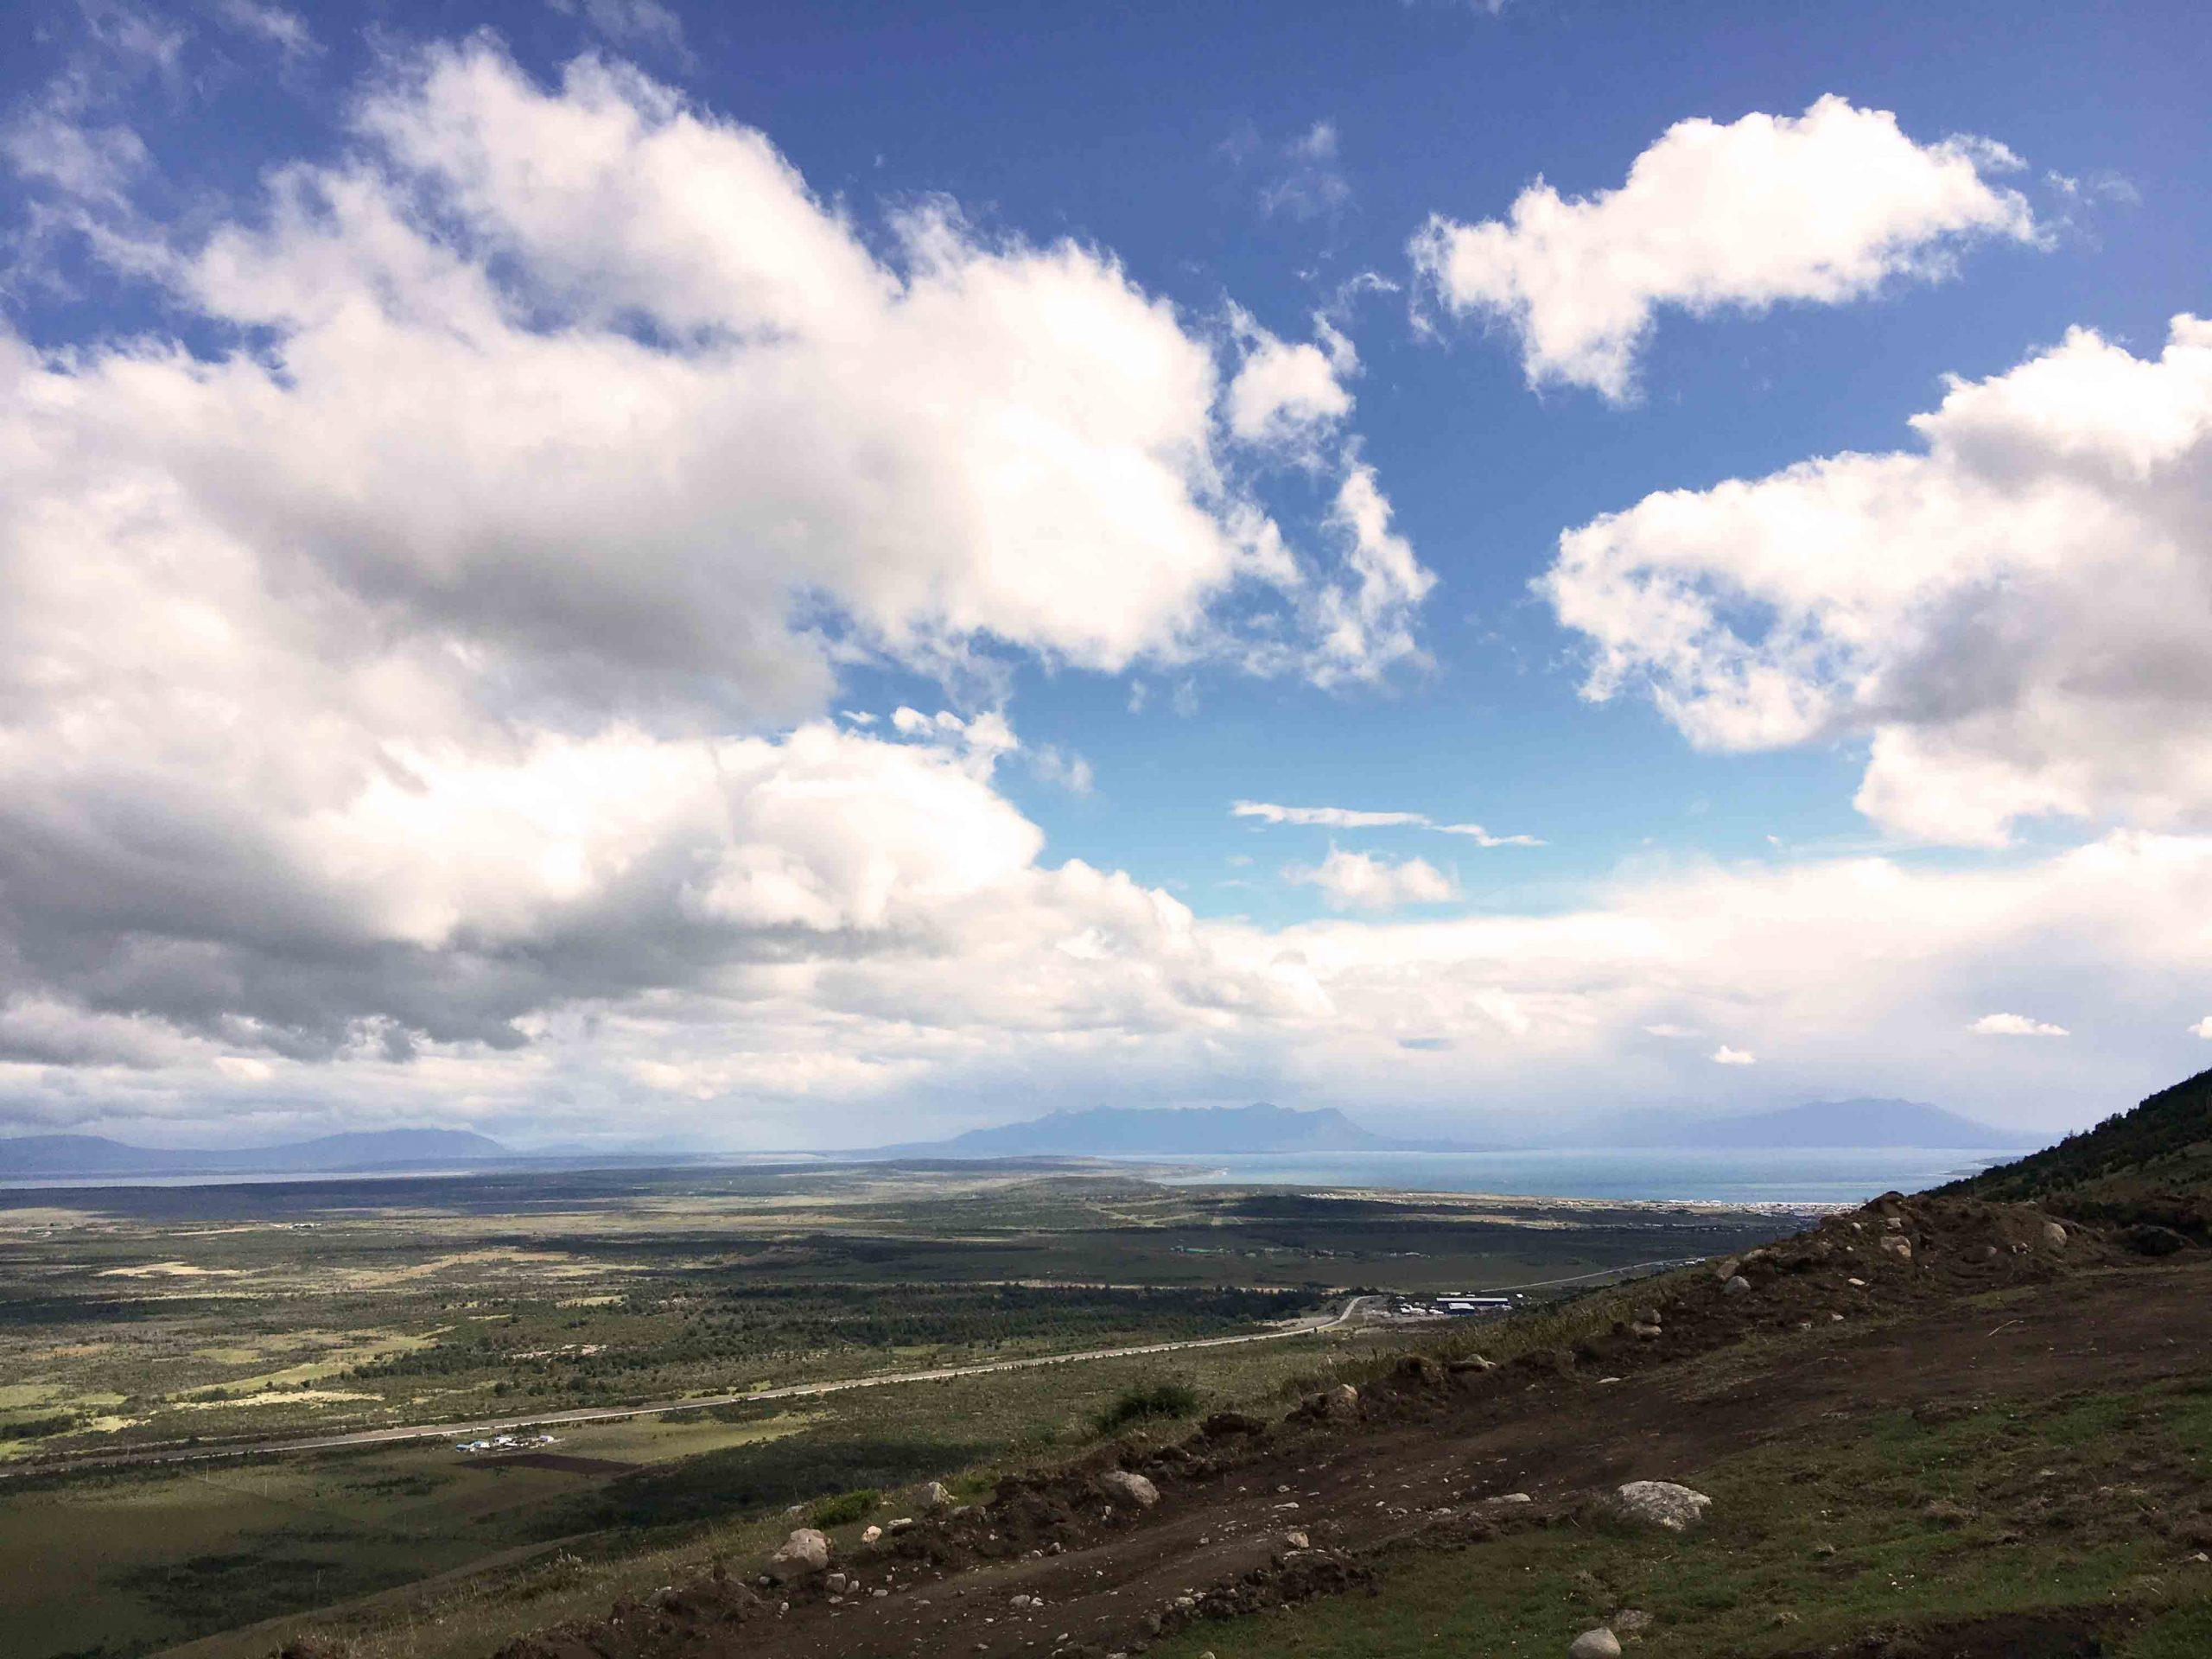 Patagonia Series Ep11: Half Day Horseback Riding to Cerro Doterra, Puerto Natales